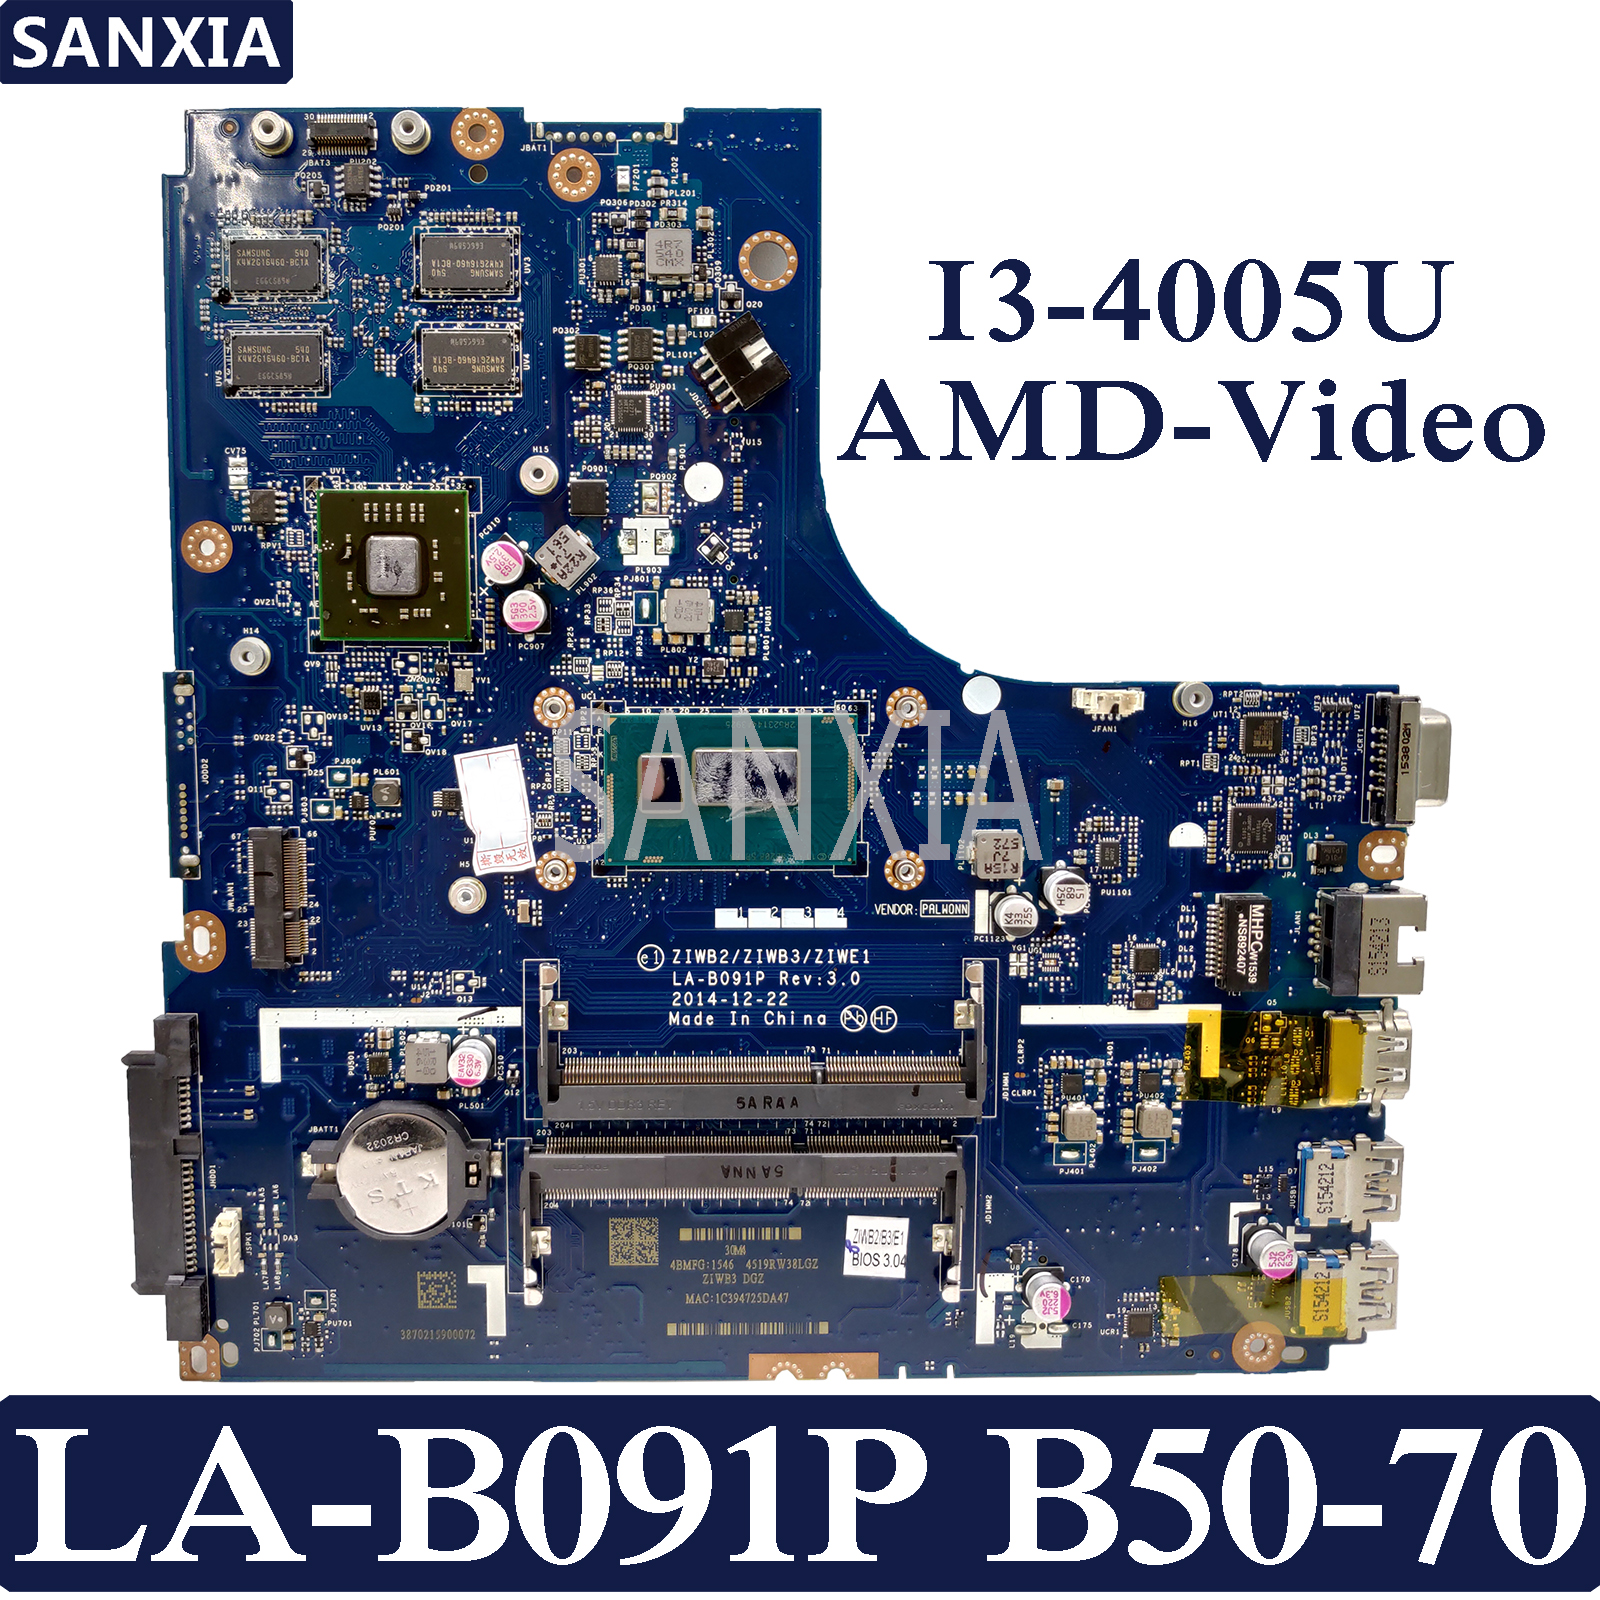 KEFU ZIWB2/ZIWB3/ZIWE1 LA-B091P Laptop motherboard for Lenovo B50-70 Test original mainboard I3-4005U AMD-VideoKEFU ZIWB2/ZIWB3/ZIWE1 LA-B091P Laptop motherboard for Lenovo B50-70 Test original mainboard I3-4005U AMD-Video